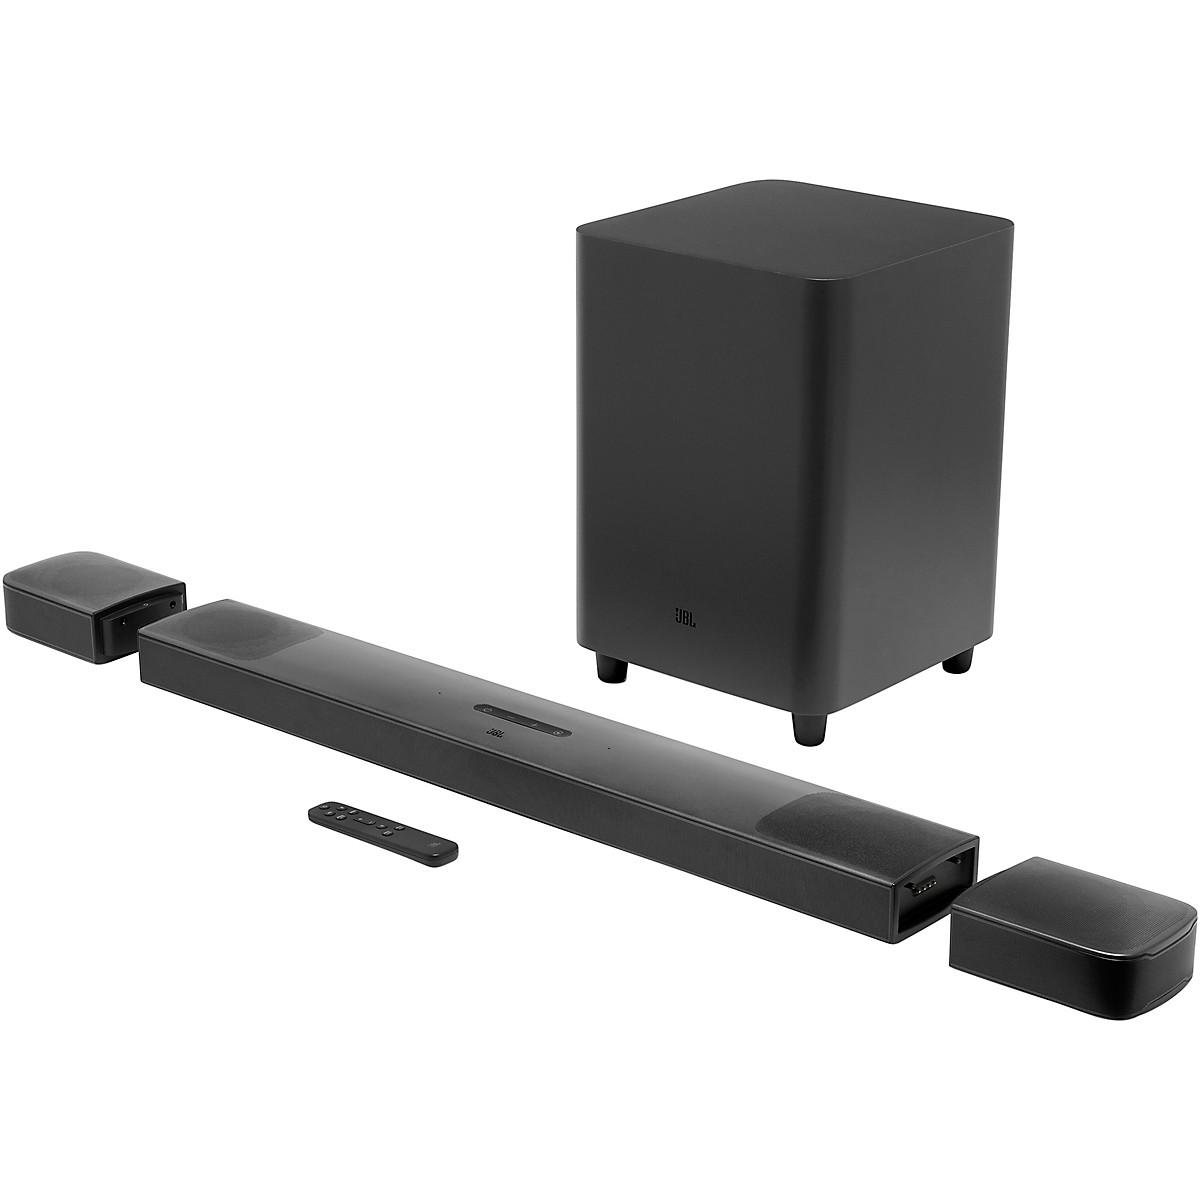 JBL Bar 9.1 3D Surround Soundbar with Wireless Subwoofer